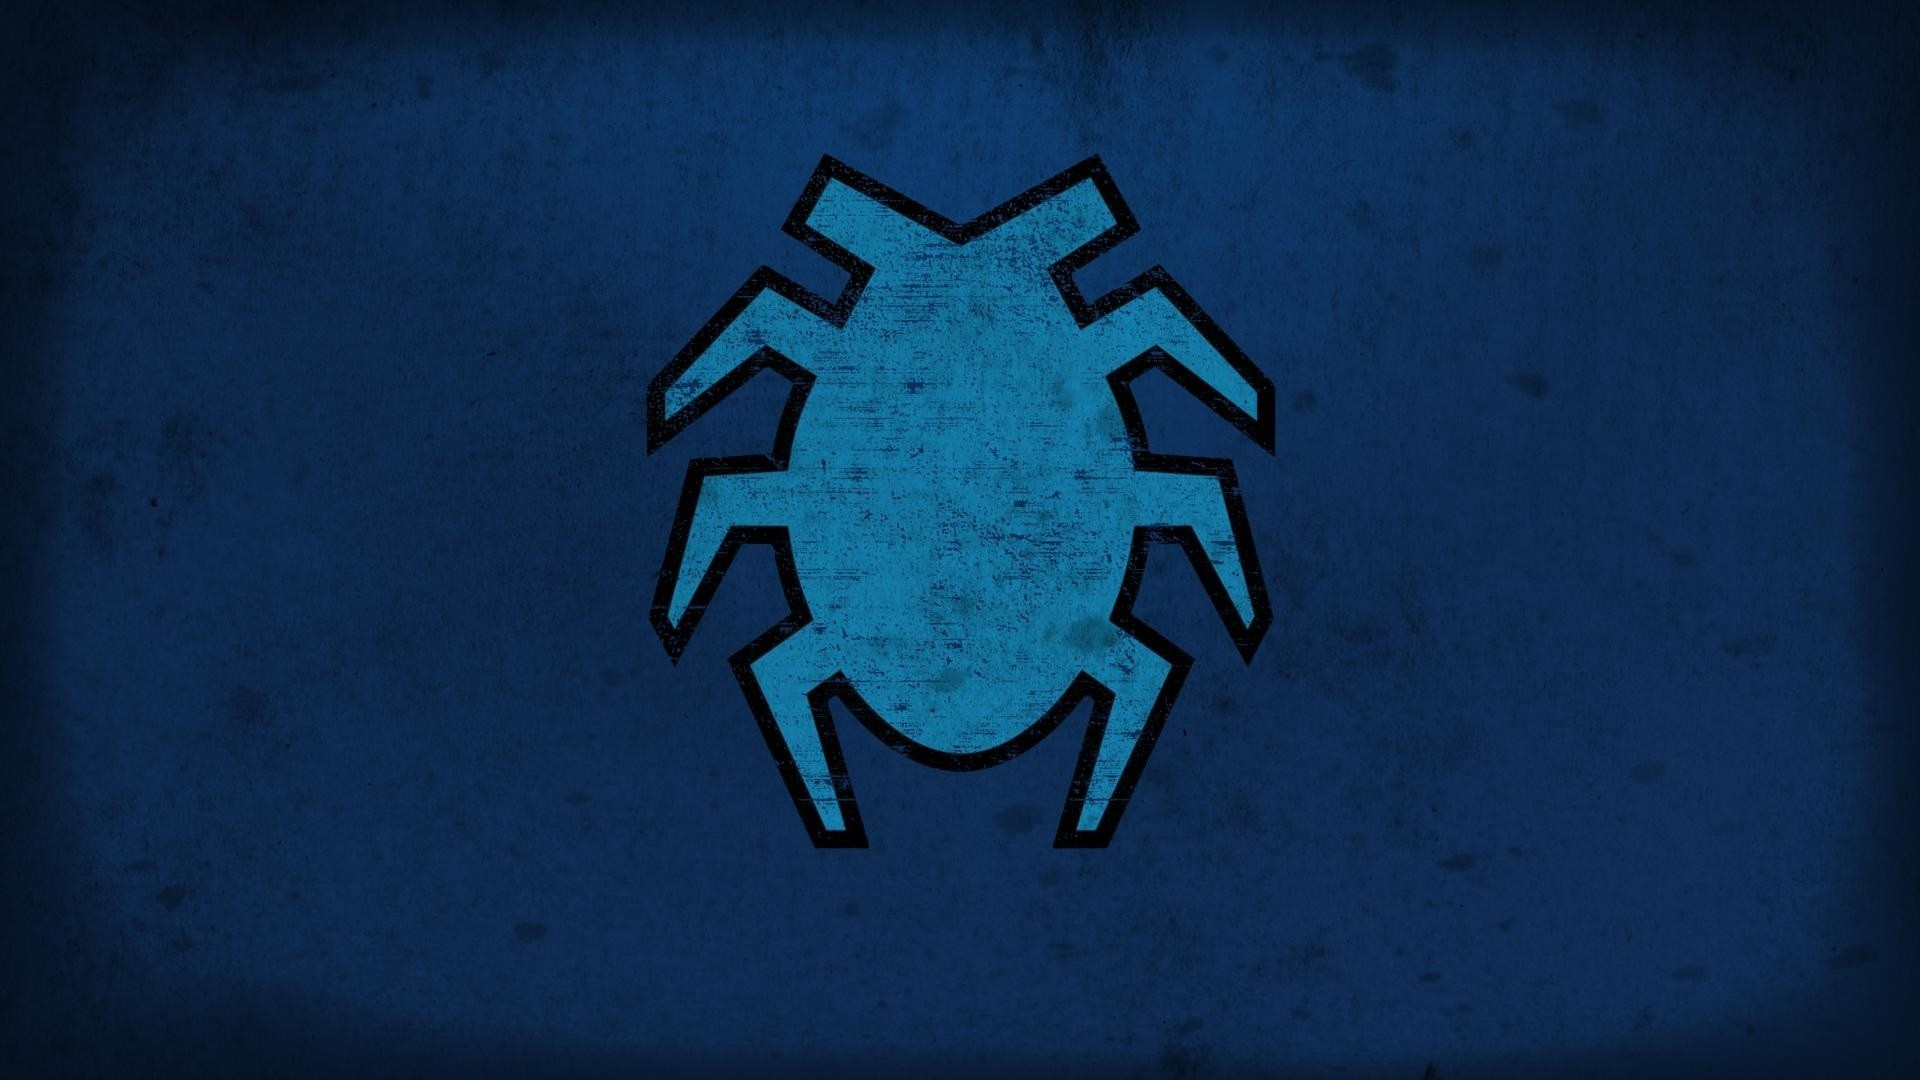 Blue Beetle wallpaper